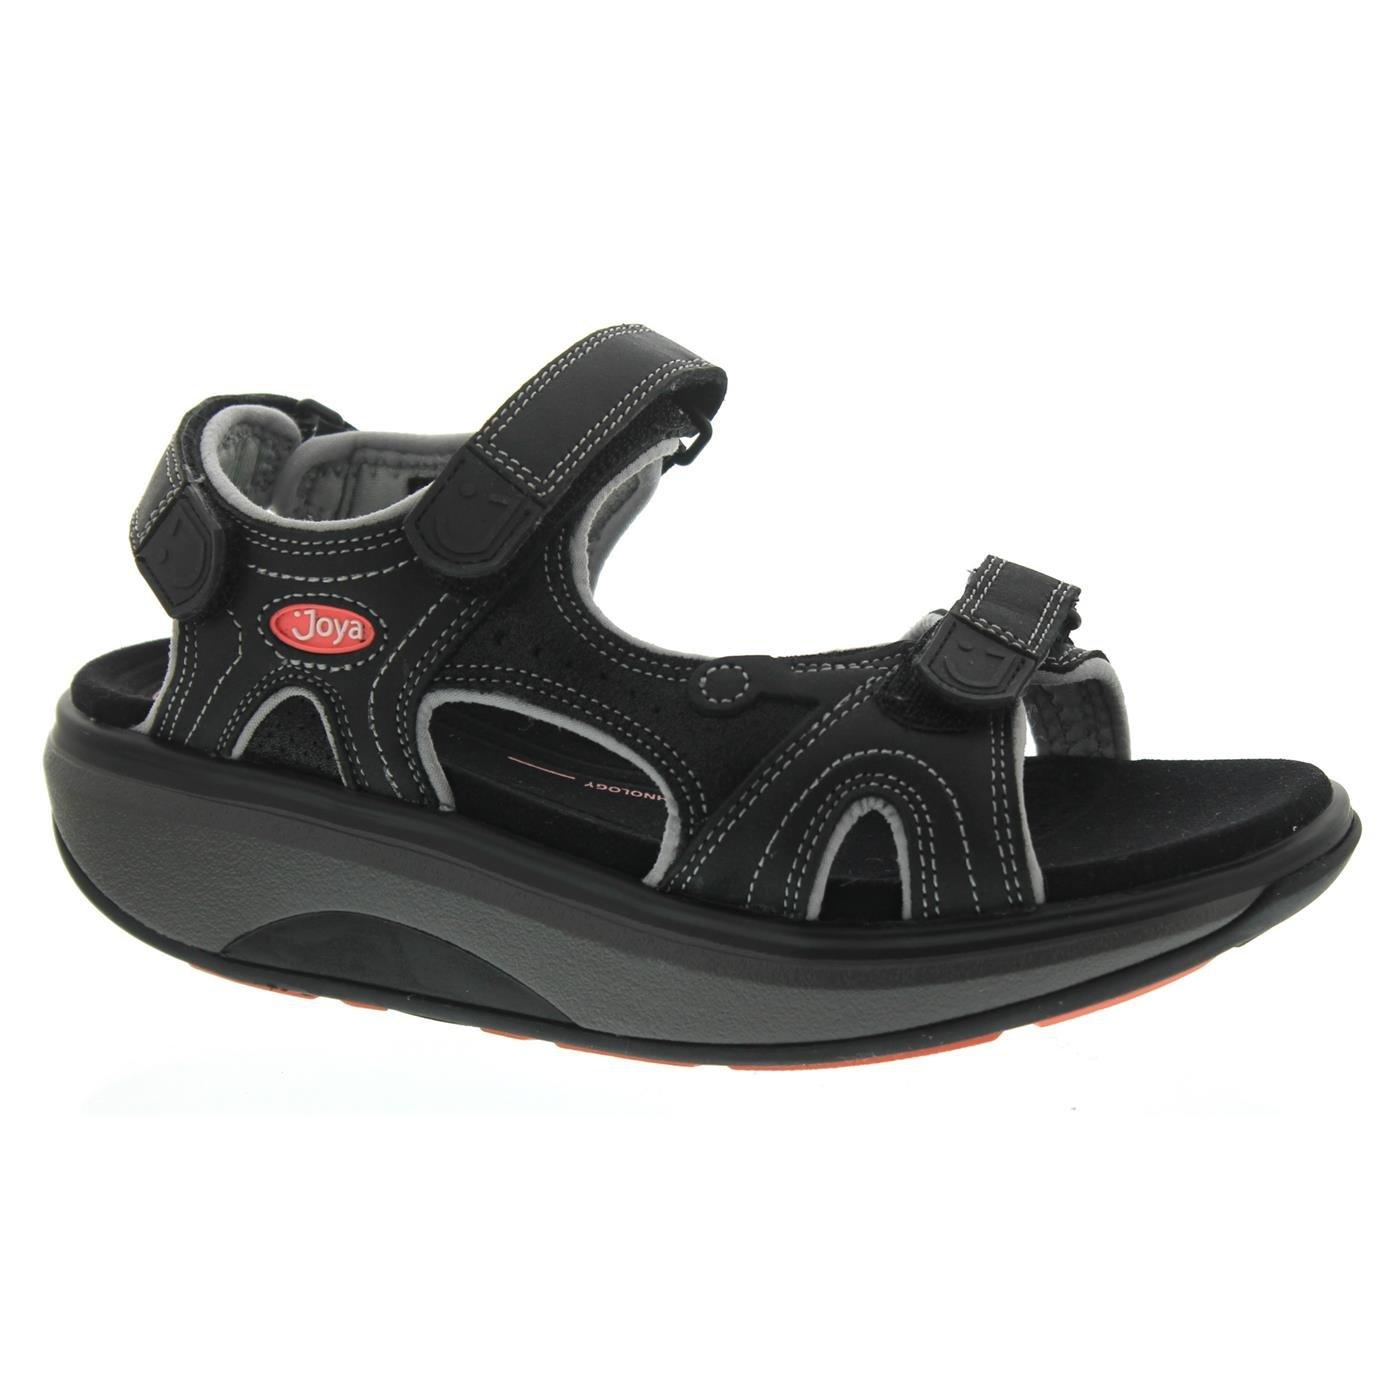 Joya schwarz Damen Sandaletten Cairo2,Soft-Roll,bla 668san schwarz Joya 262491 1e3b2e